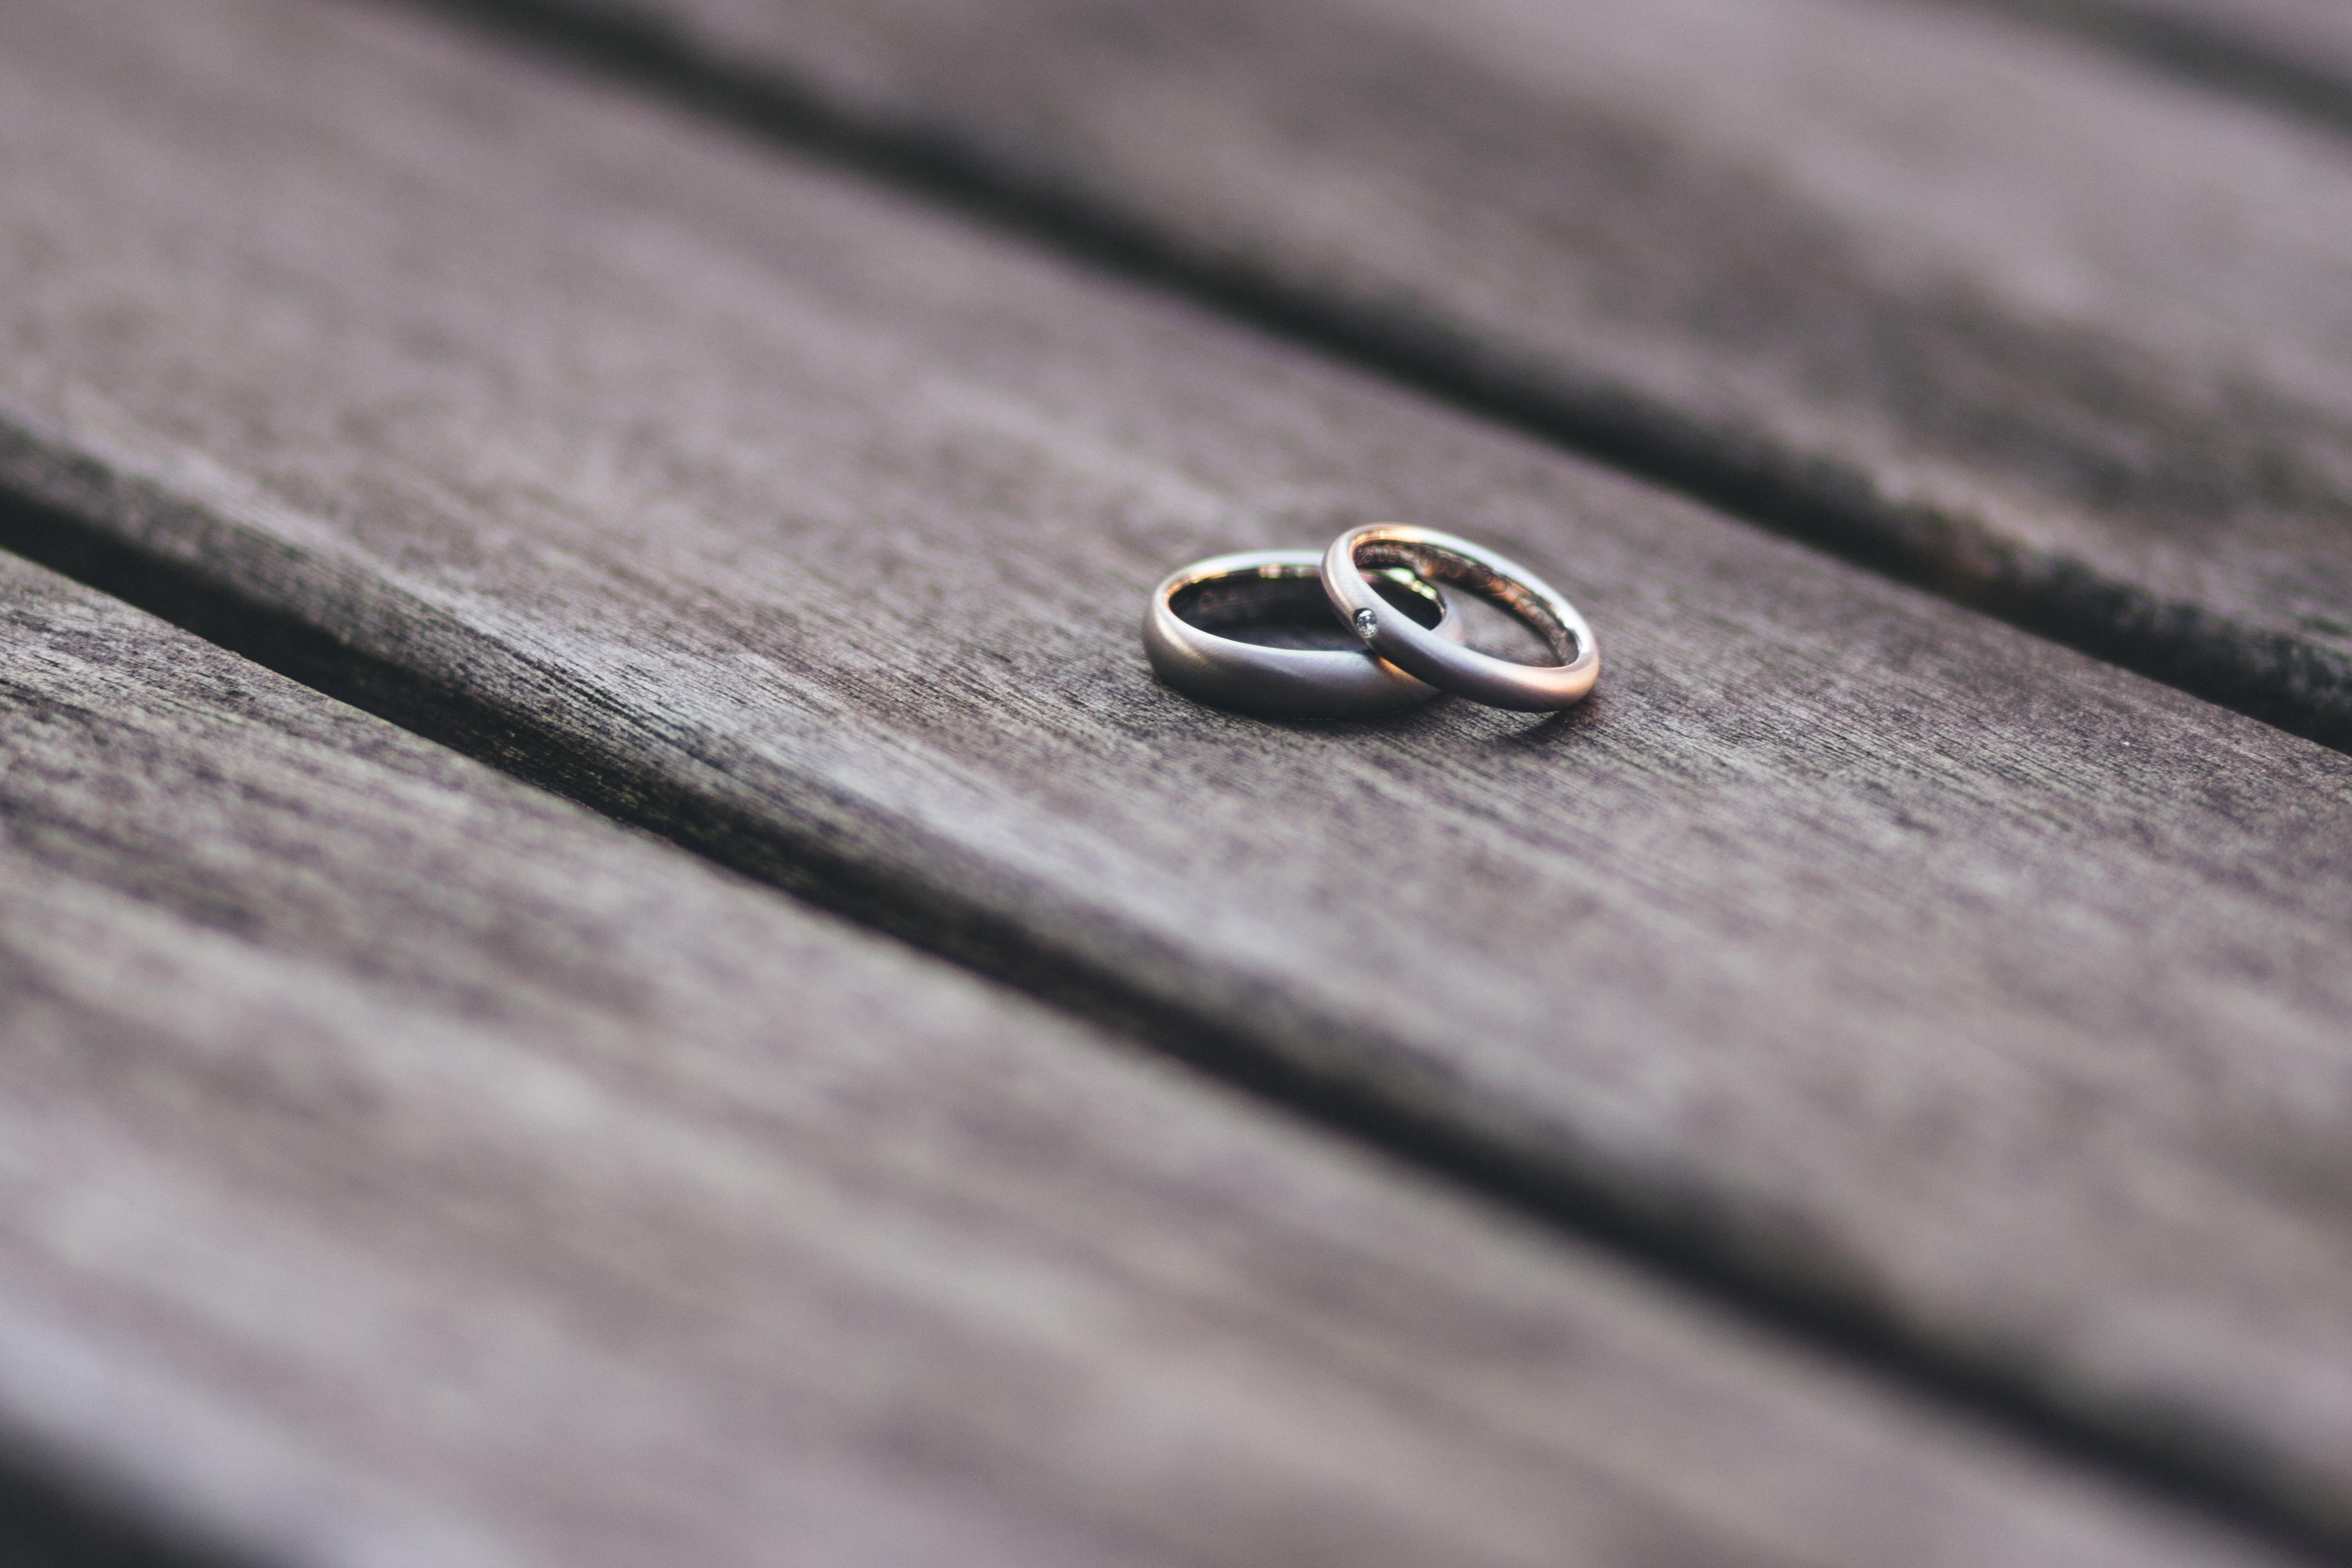 500 Engaging Wedding Rings Photos Pexels Free Stock Photos